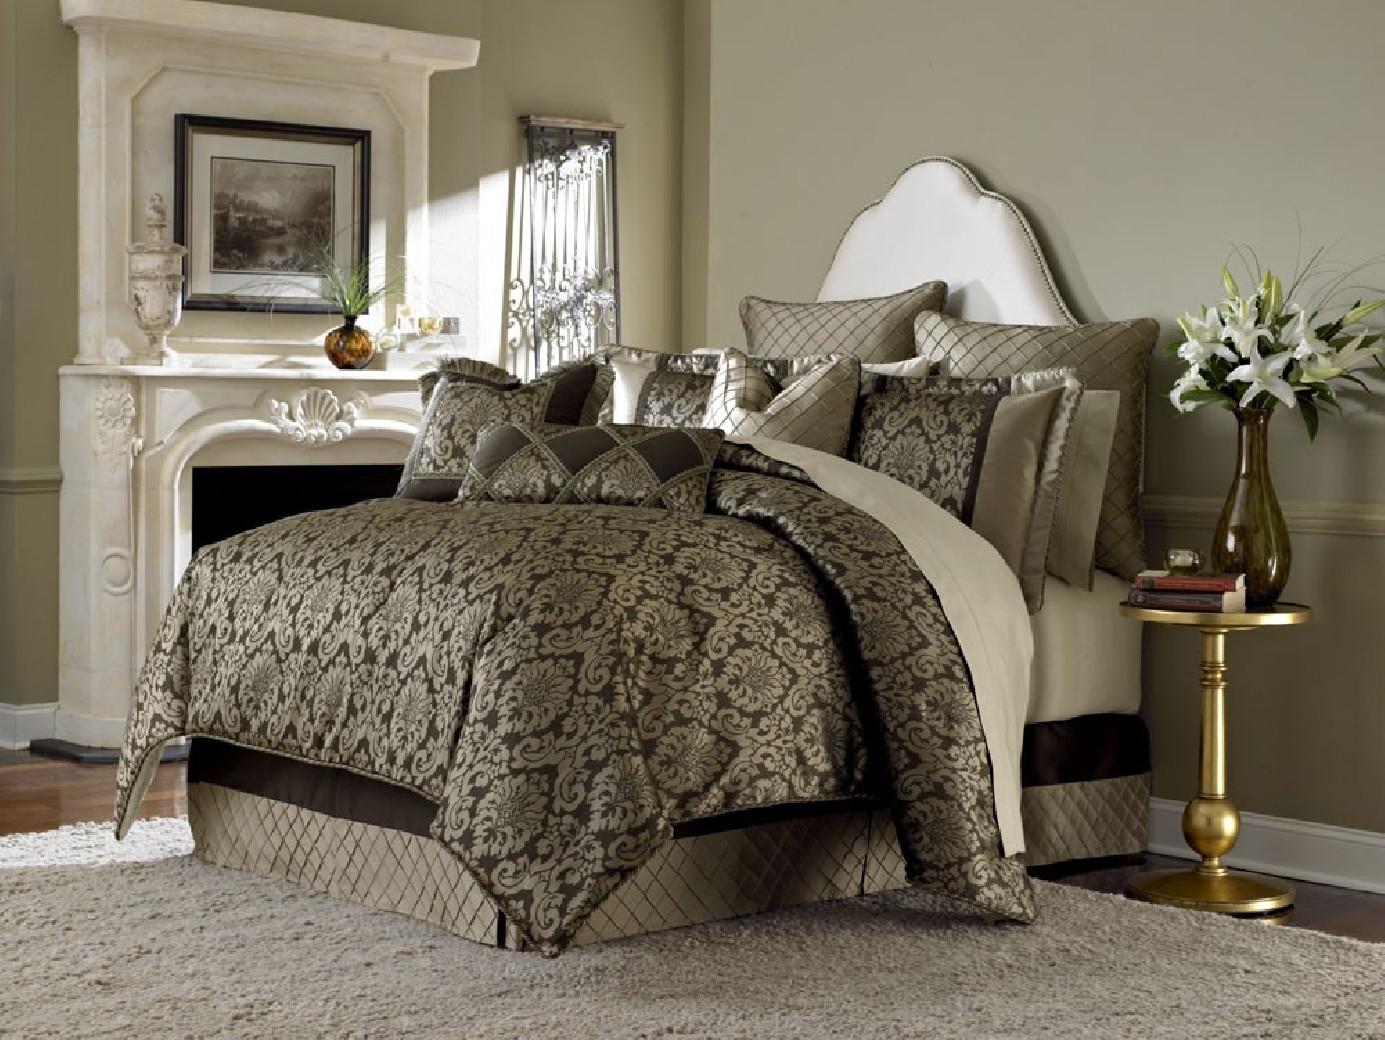 Michael Amini Imperial Comforter Bedding Set By Aico